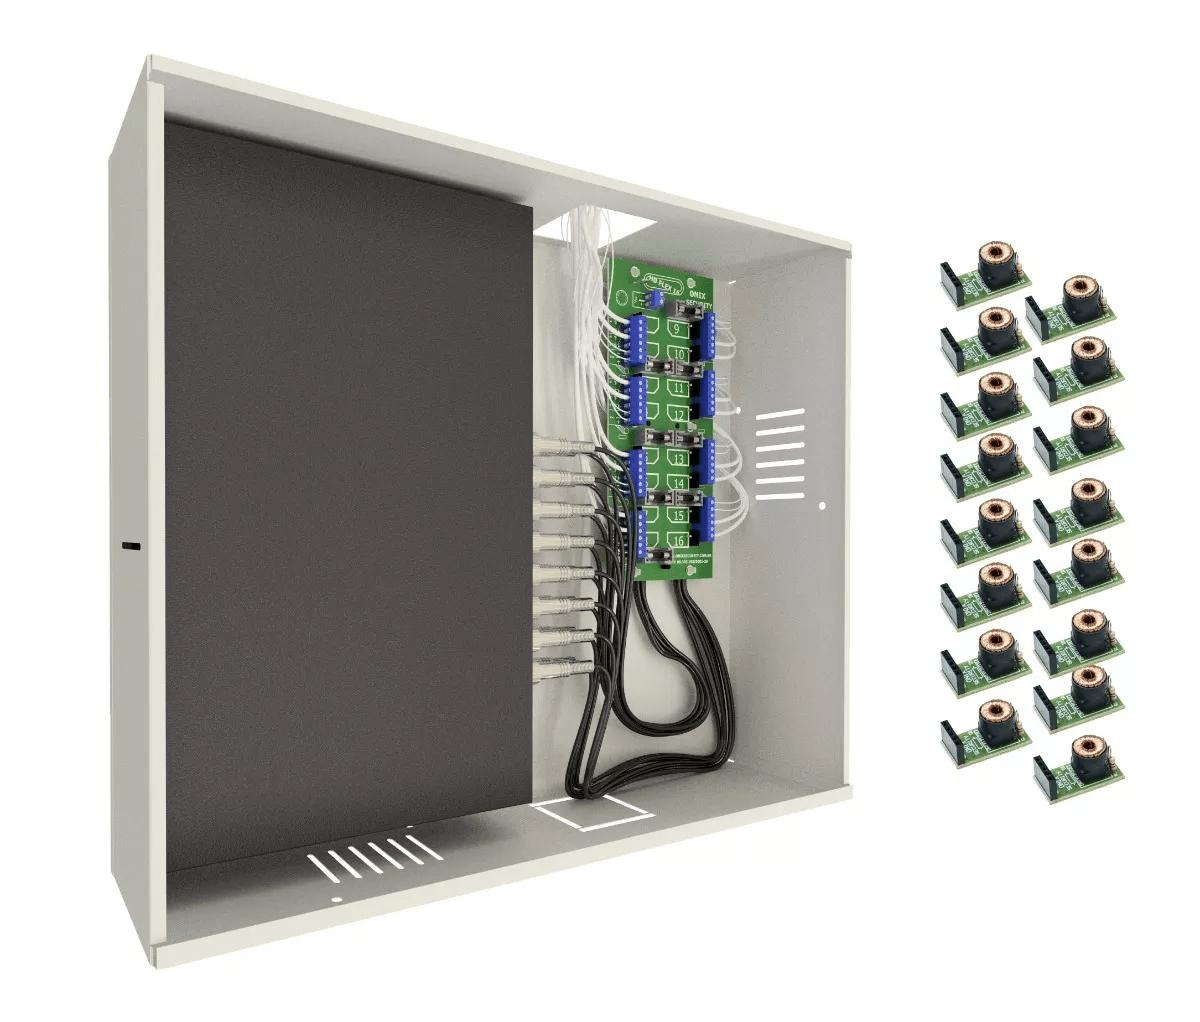 Rack 16ch Organizador Mini Orion Hd3000 Onix + 16 Balun Rack